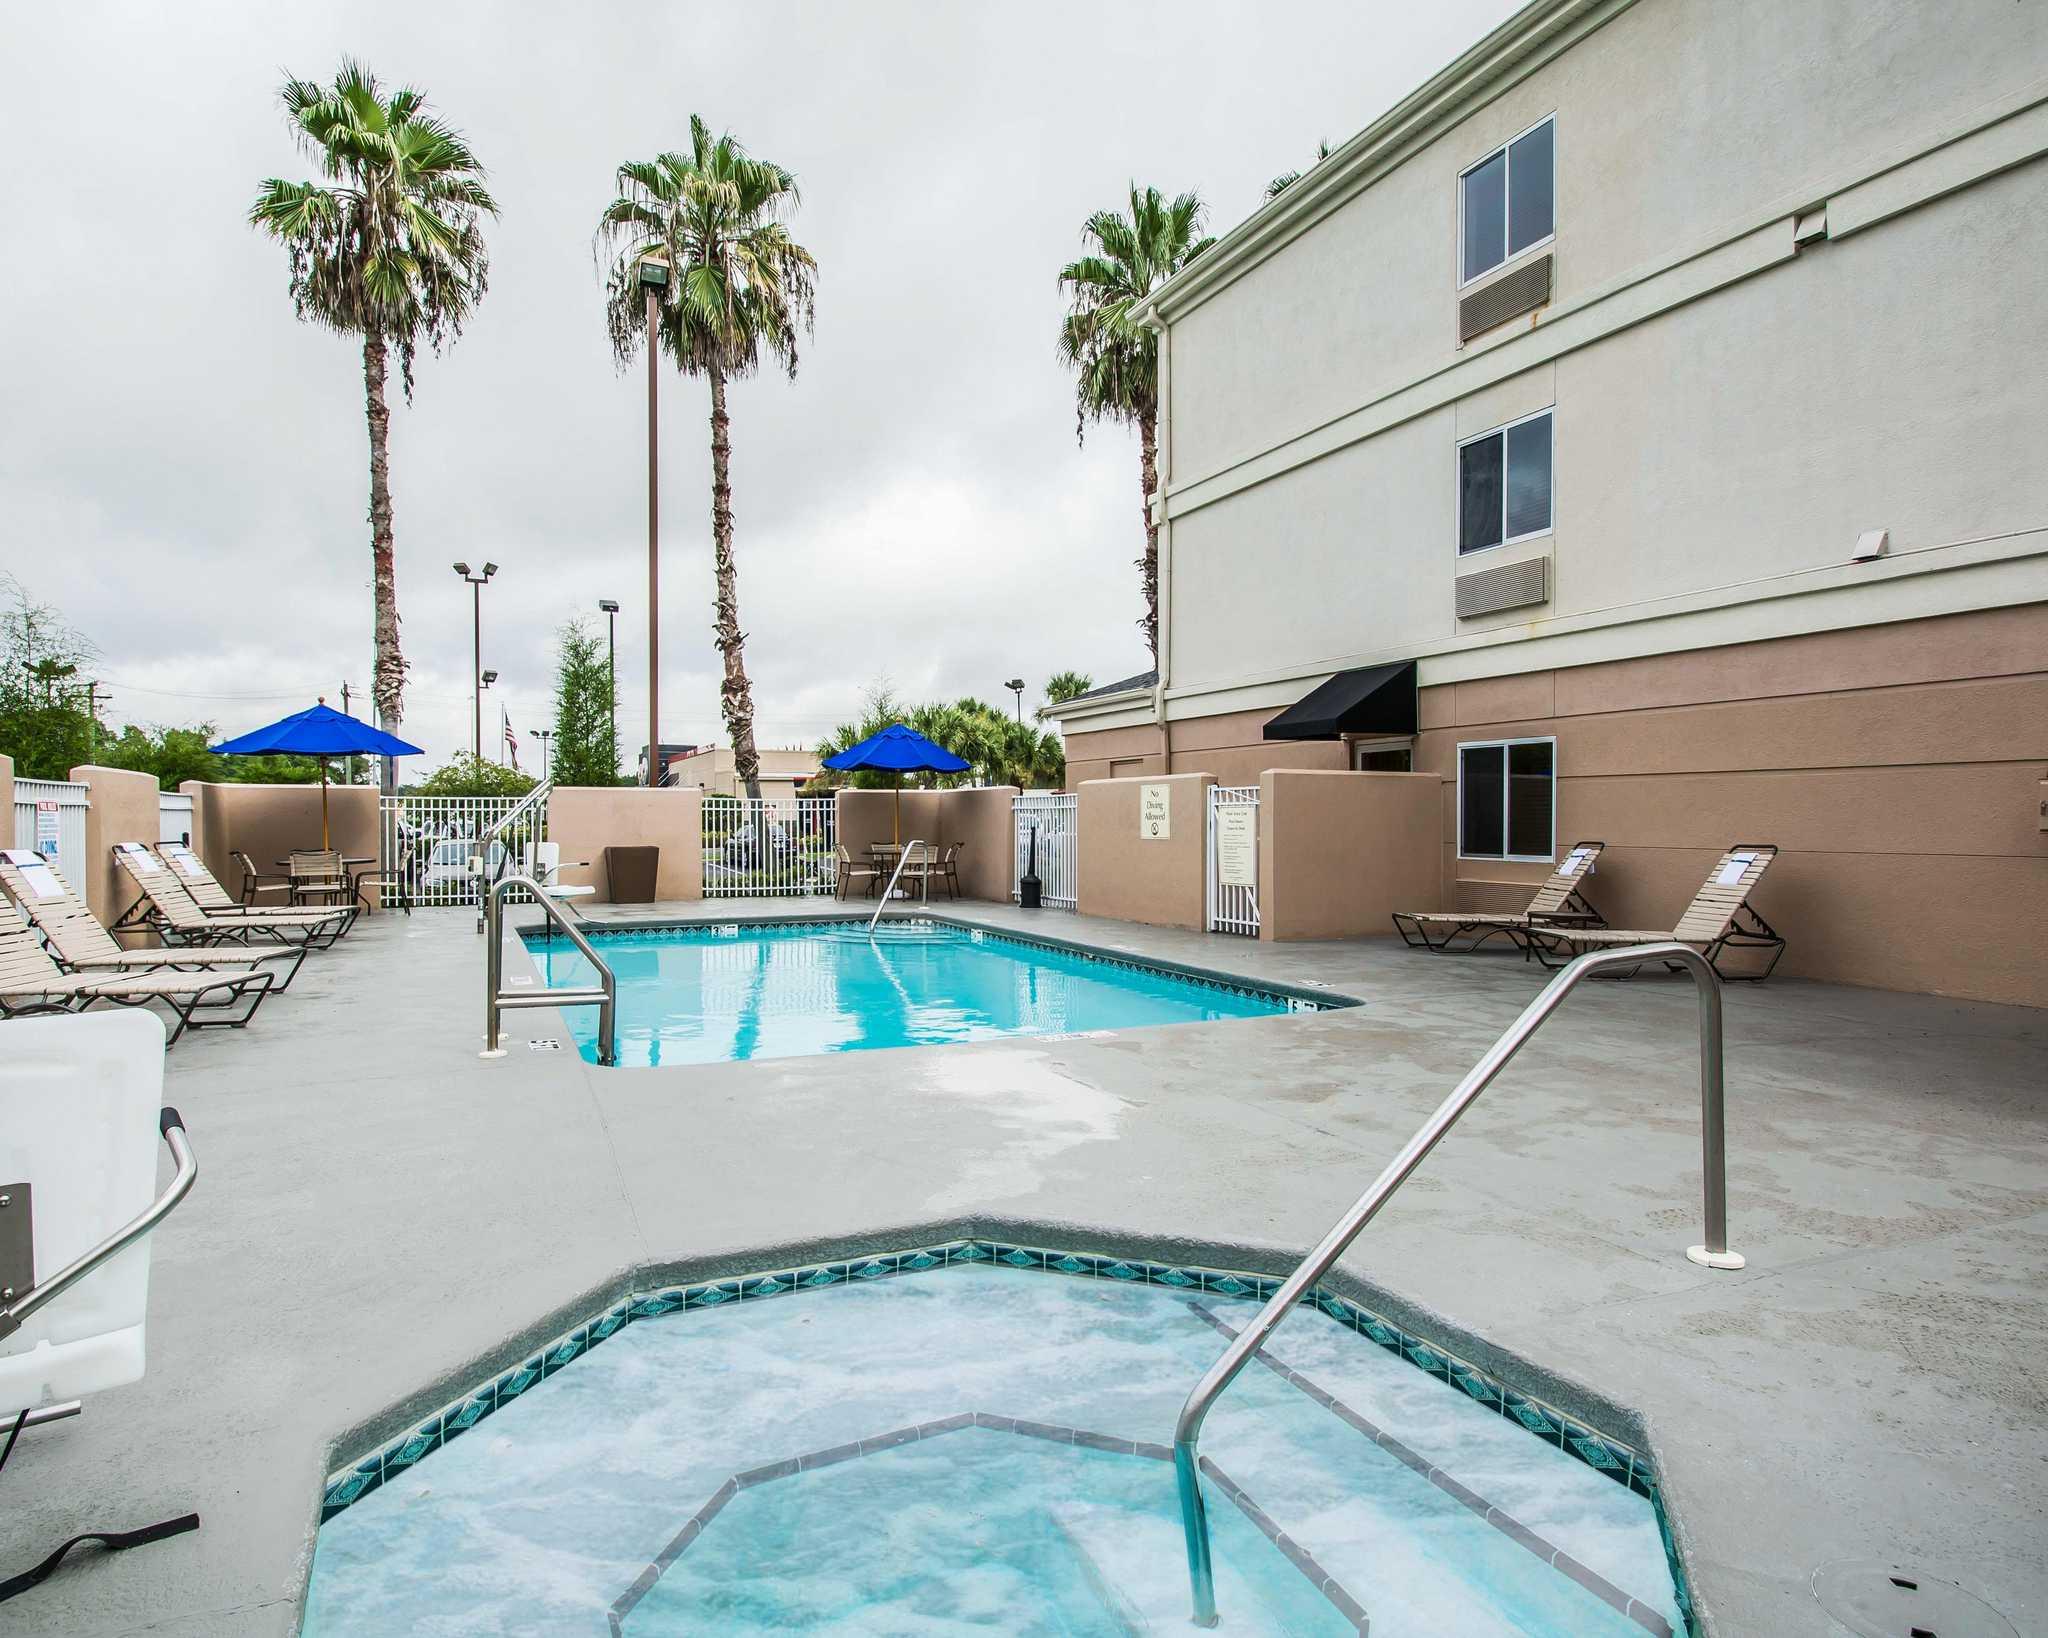 Hotels Motels Plant City Florida